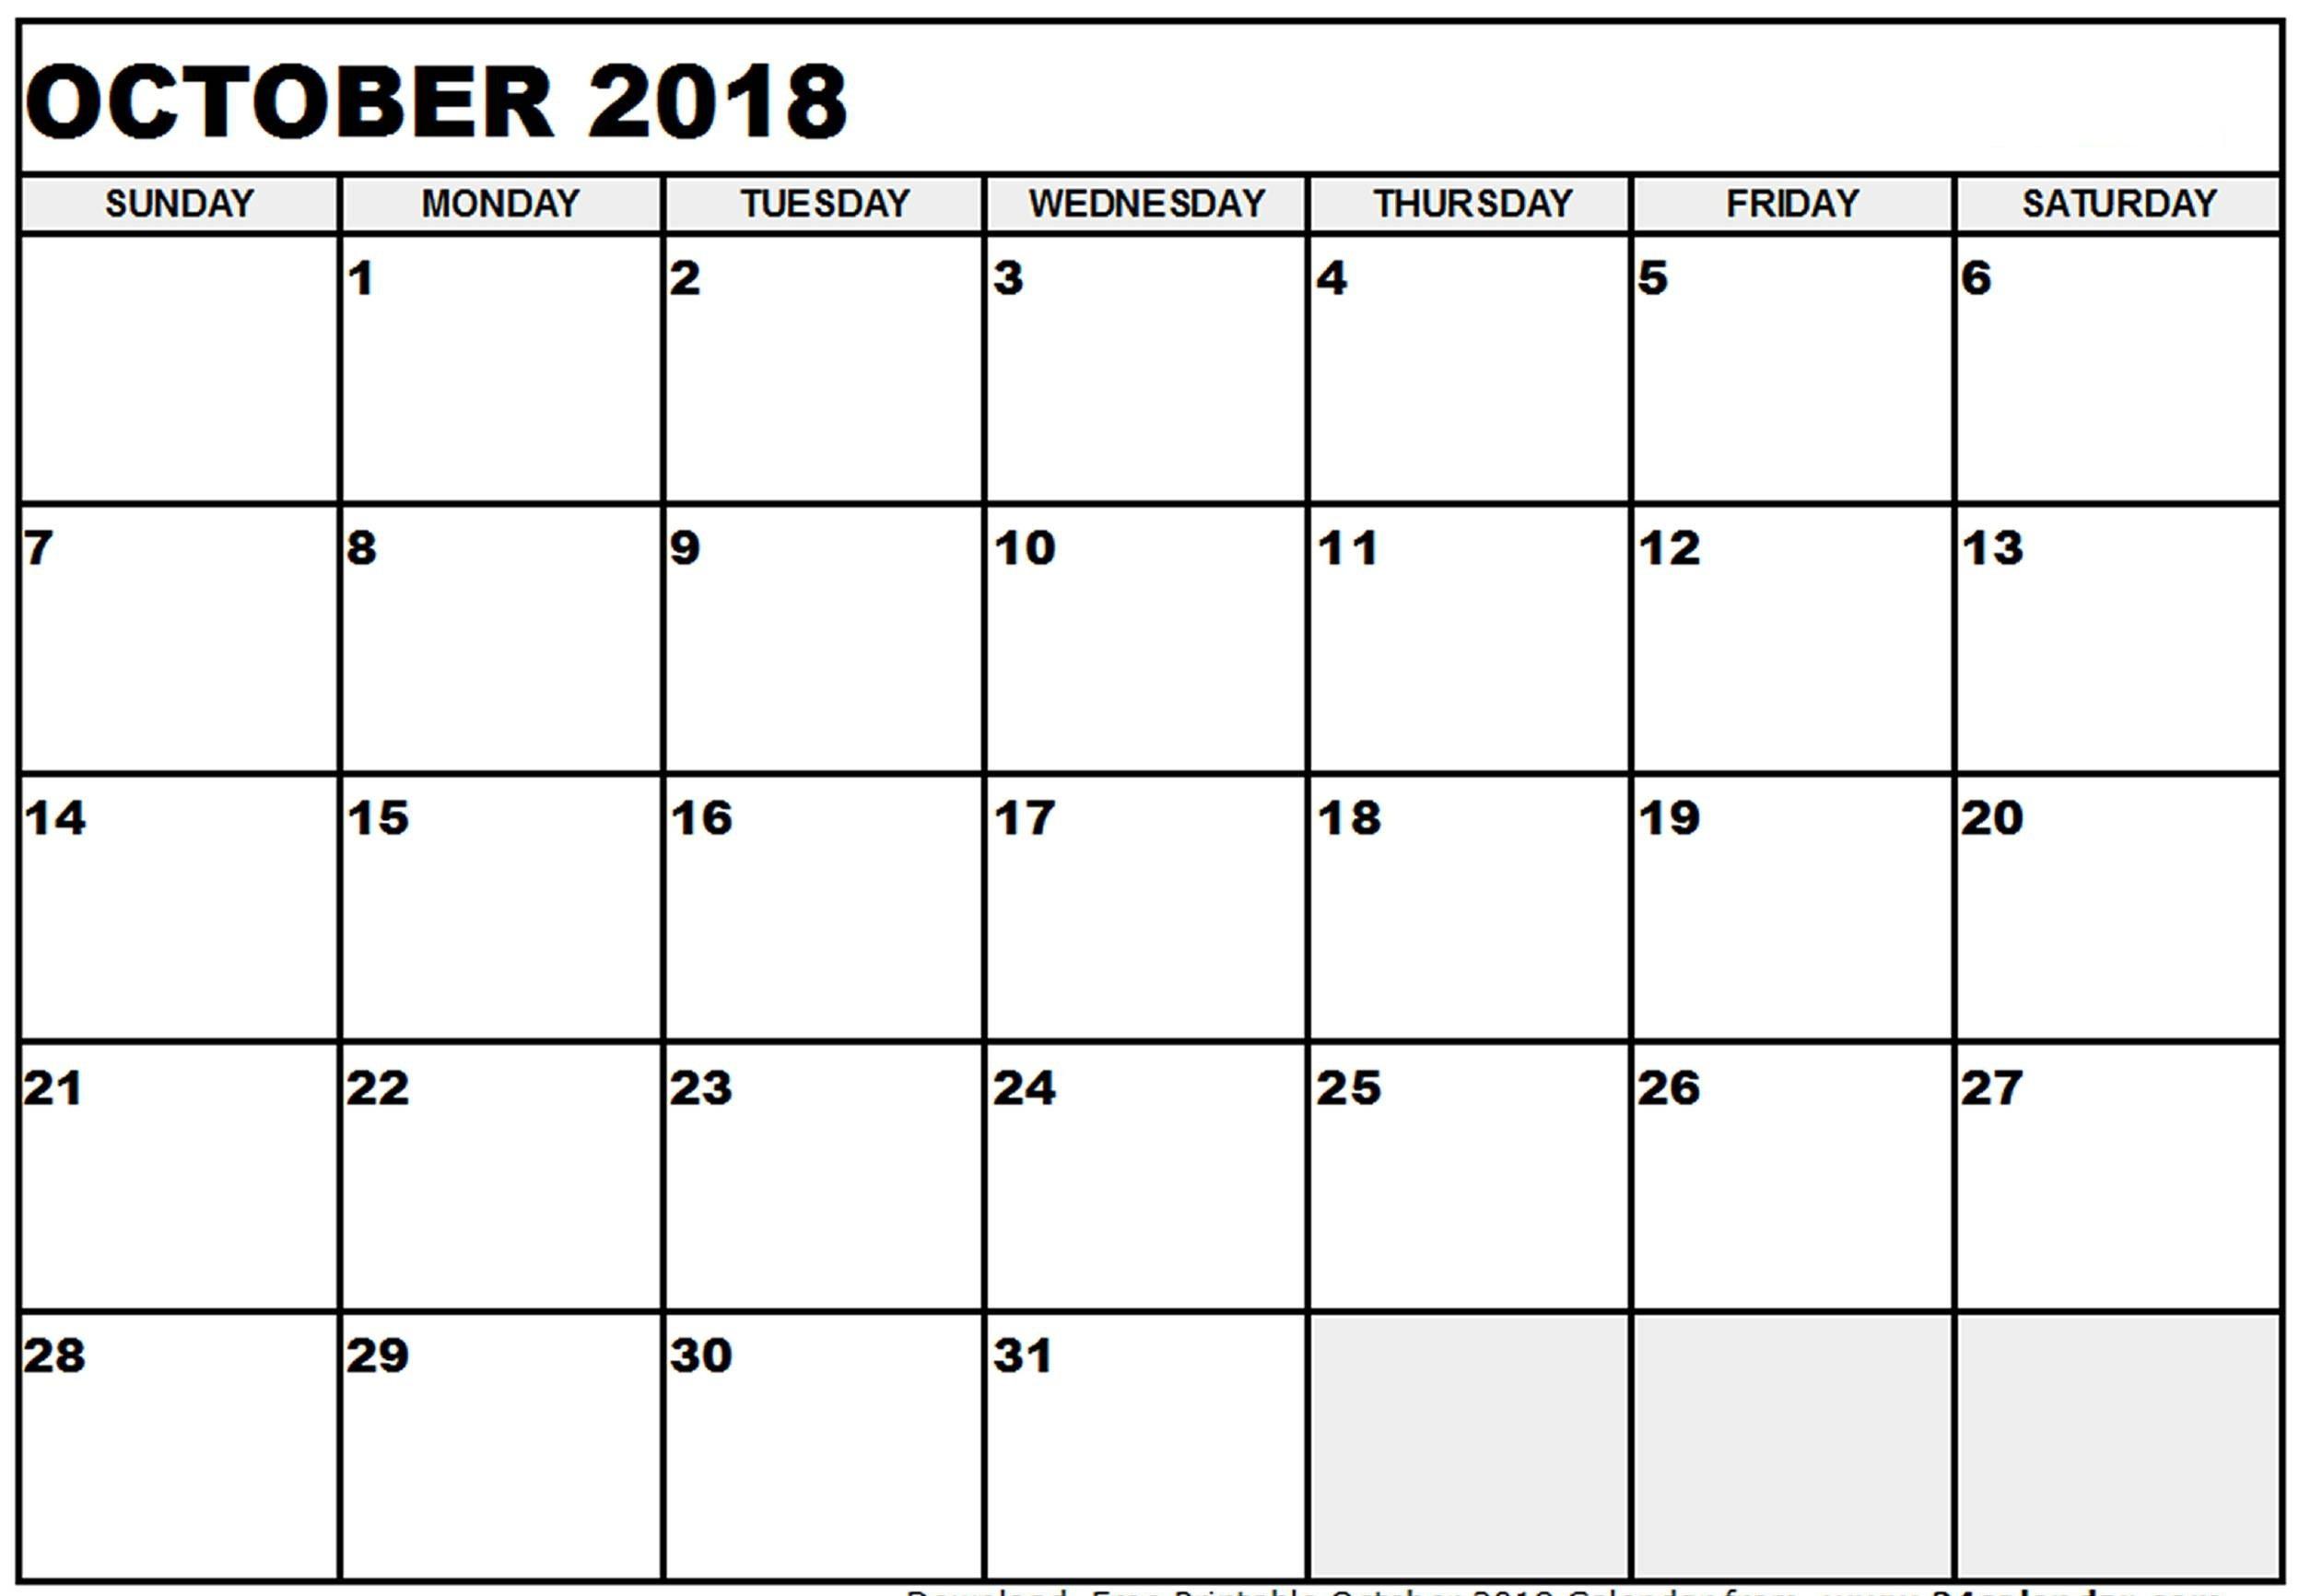 October Calendar 2018 Blank in October Calendar Printable Template